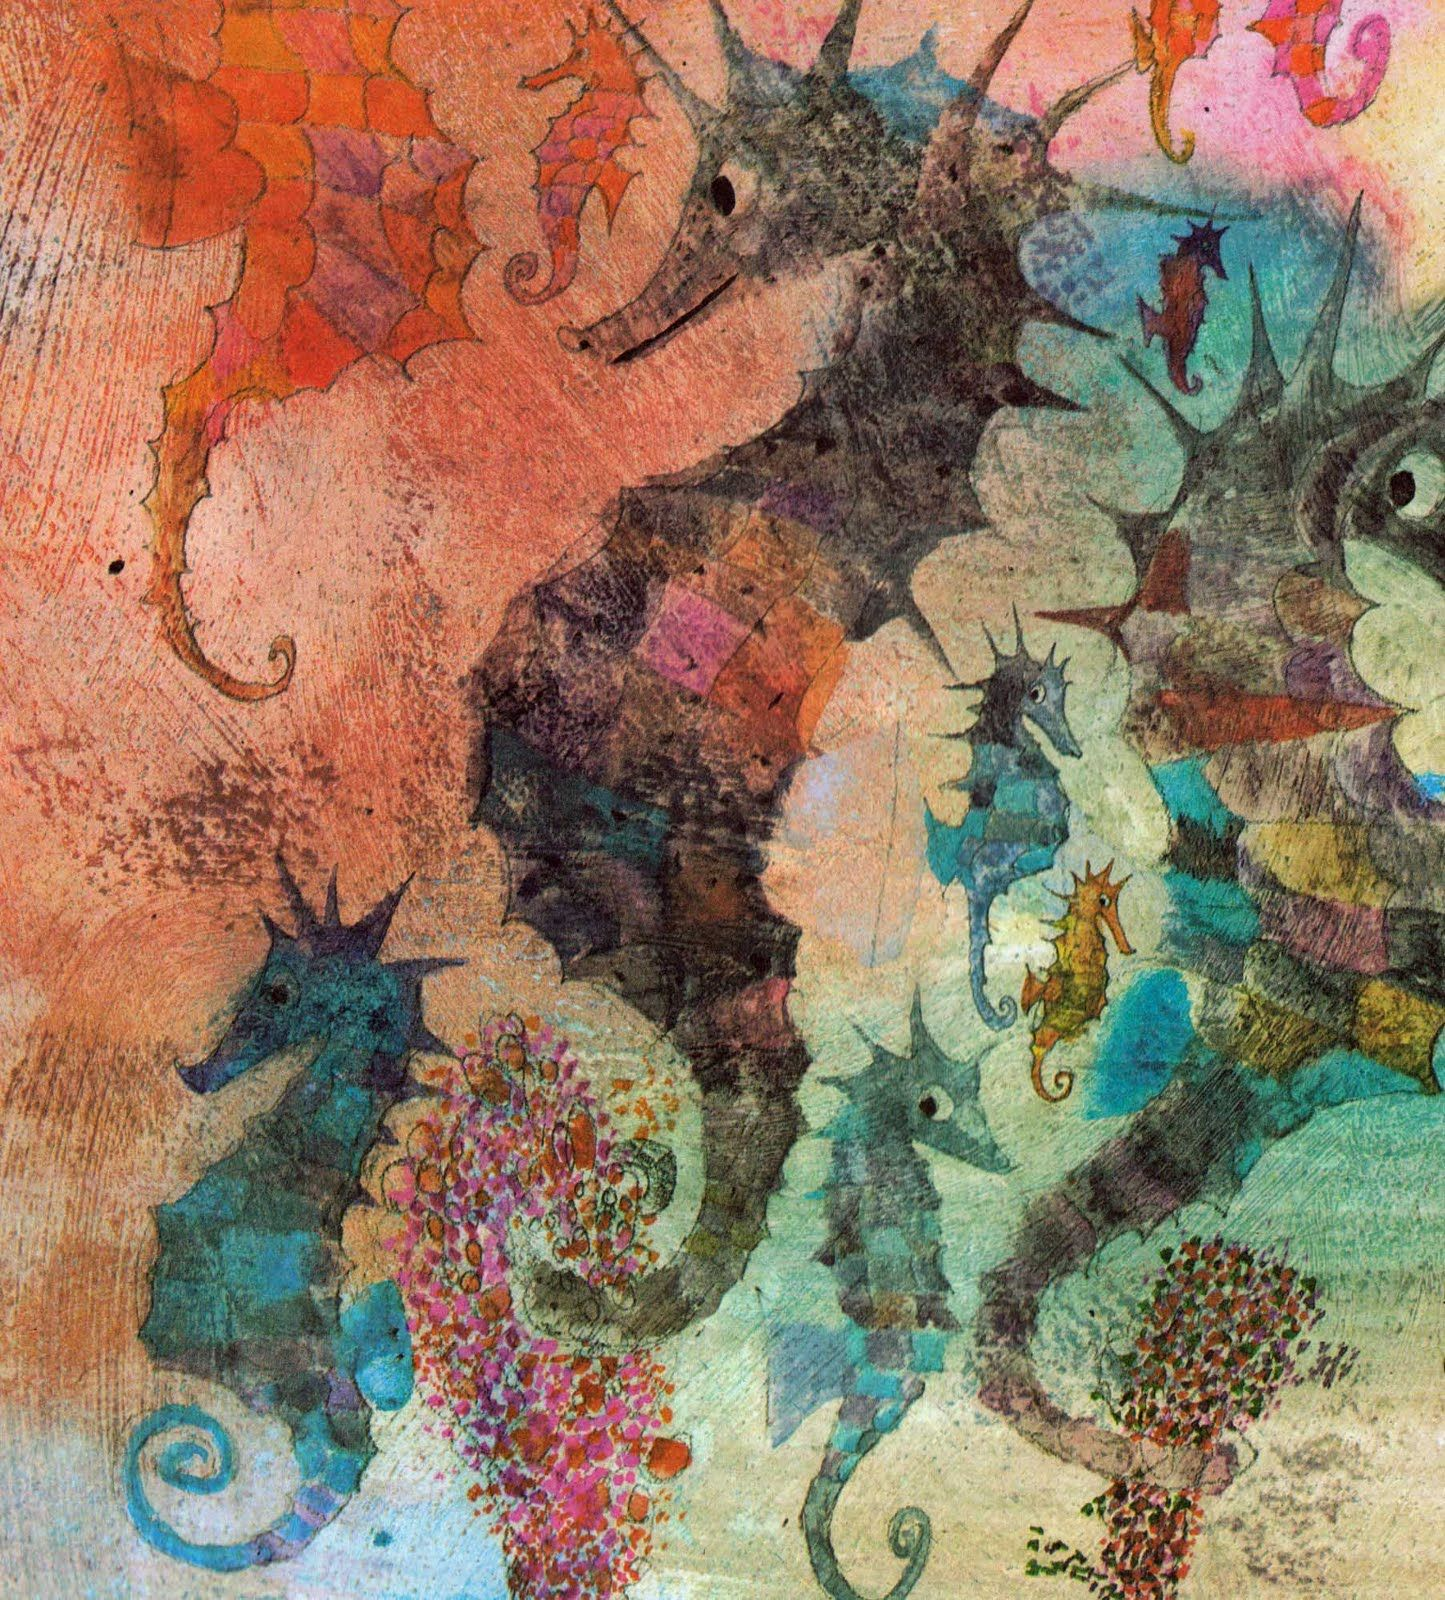 Watercolor books for kids - Brian Wildsmith Seahorse Artseahorsesbook Illustrationsillustration Art Book Artvintage Kidswatercolor